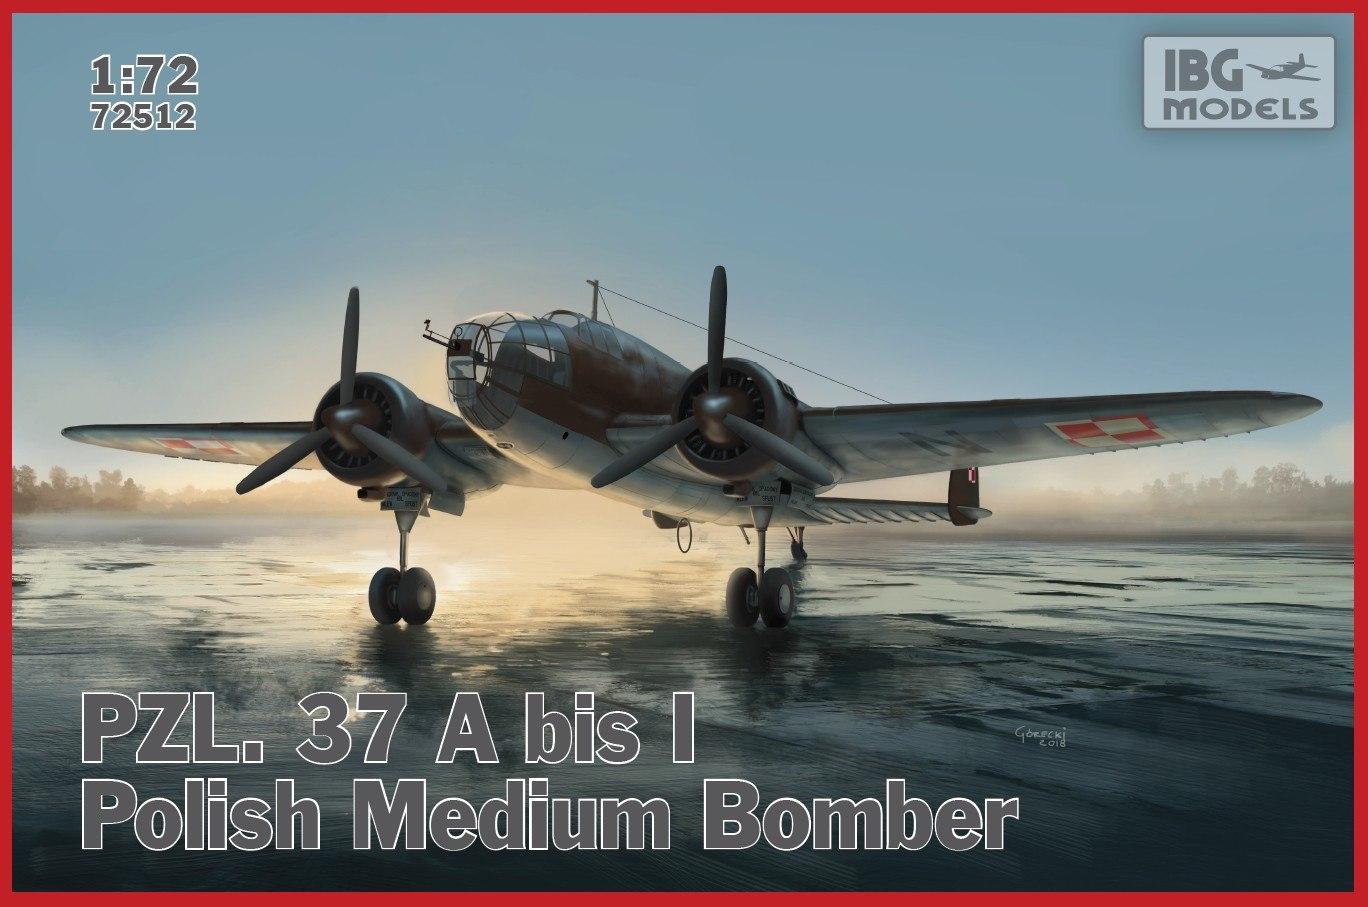 1/72 PZL. 37 A bis Łoś – Polish Bomber Plane 72512